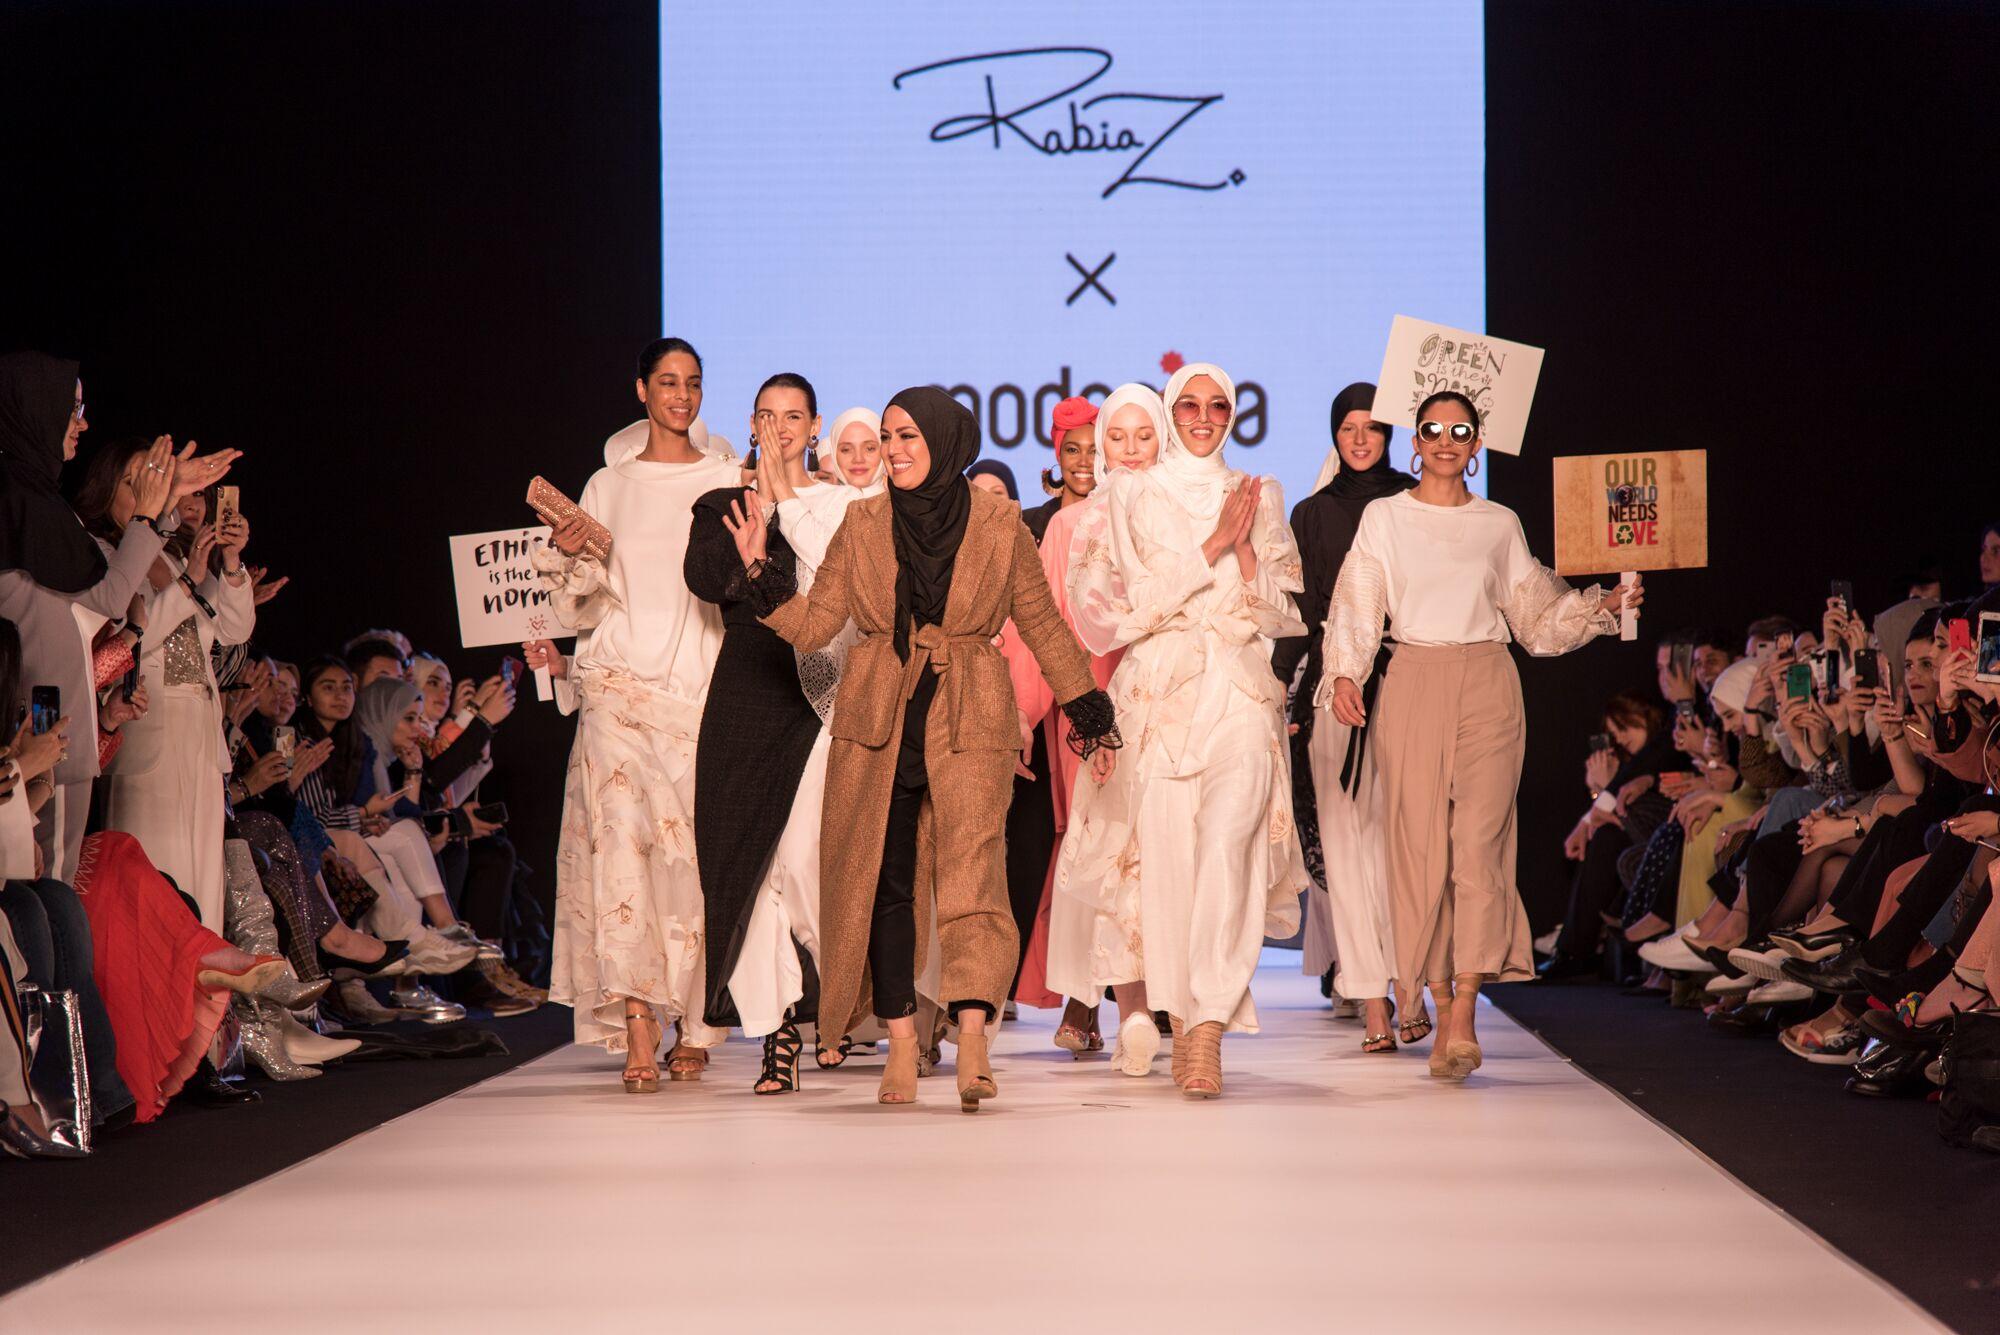 Rabia z at istanbul modest fashion week 2019 day 1